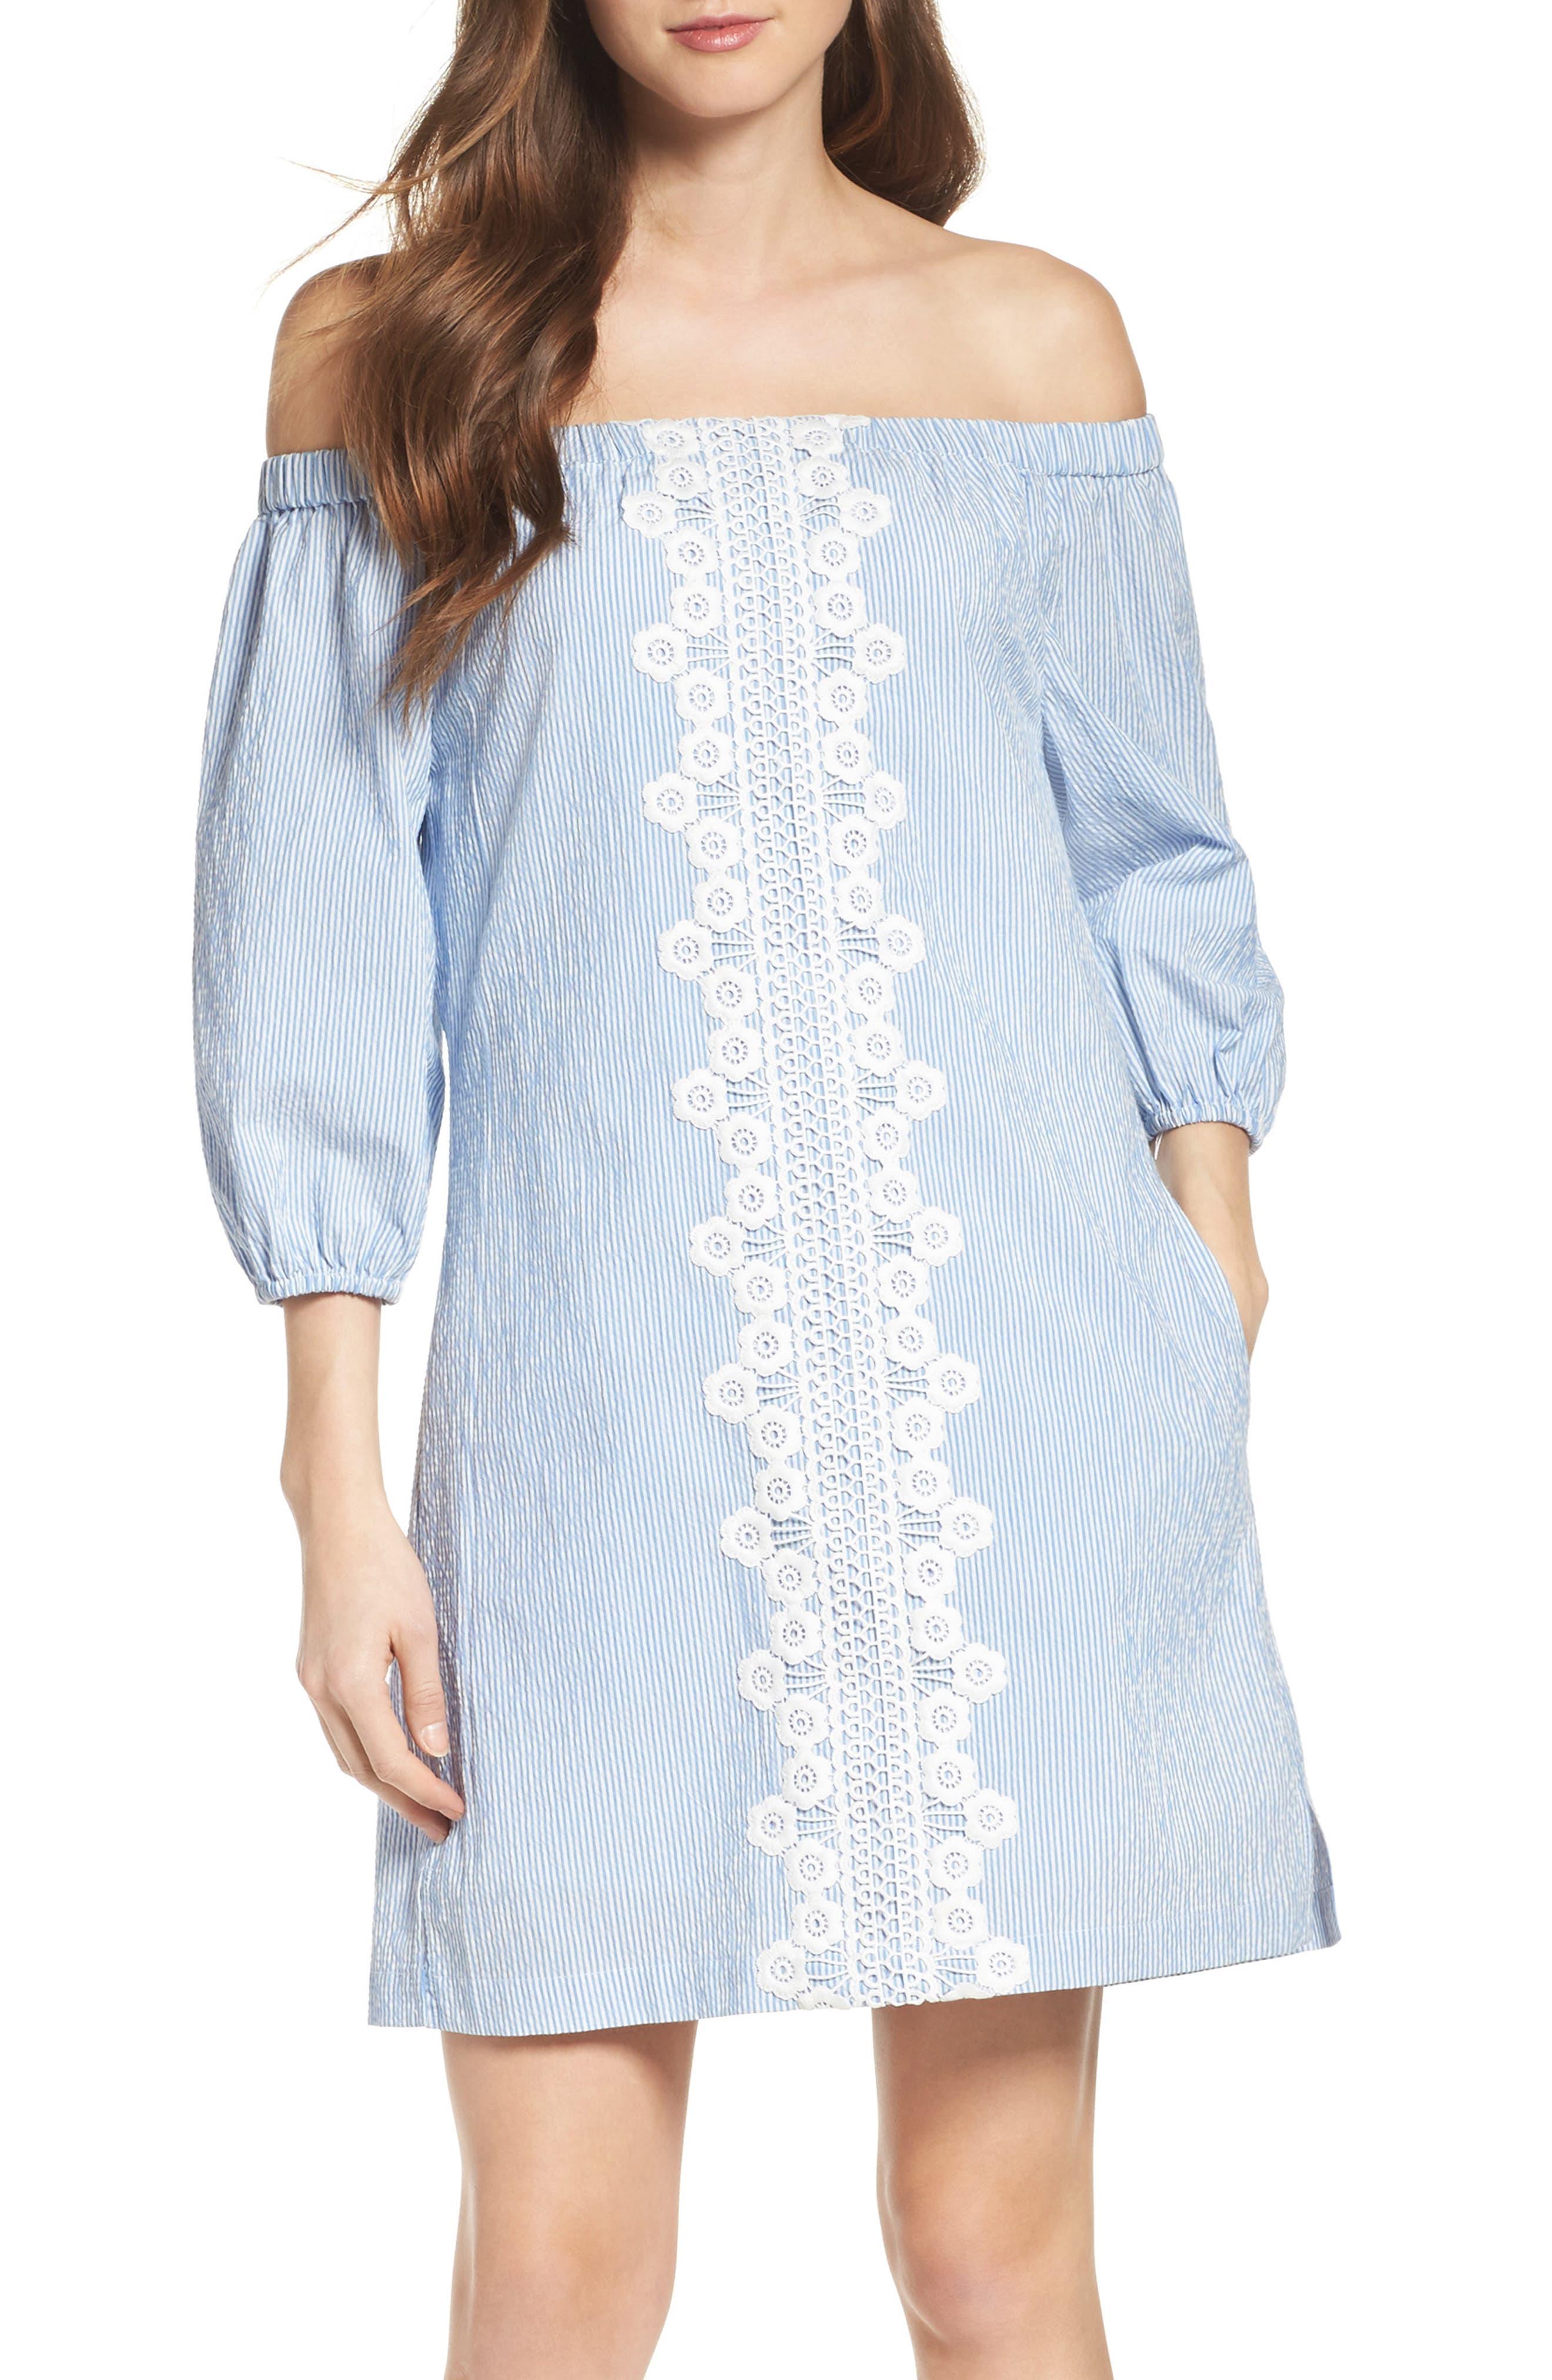 Main Image - Eliza J Lace Trim Seersucker Off the Shoulder Dress (Regular & Petite)